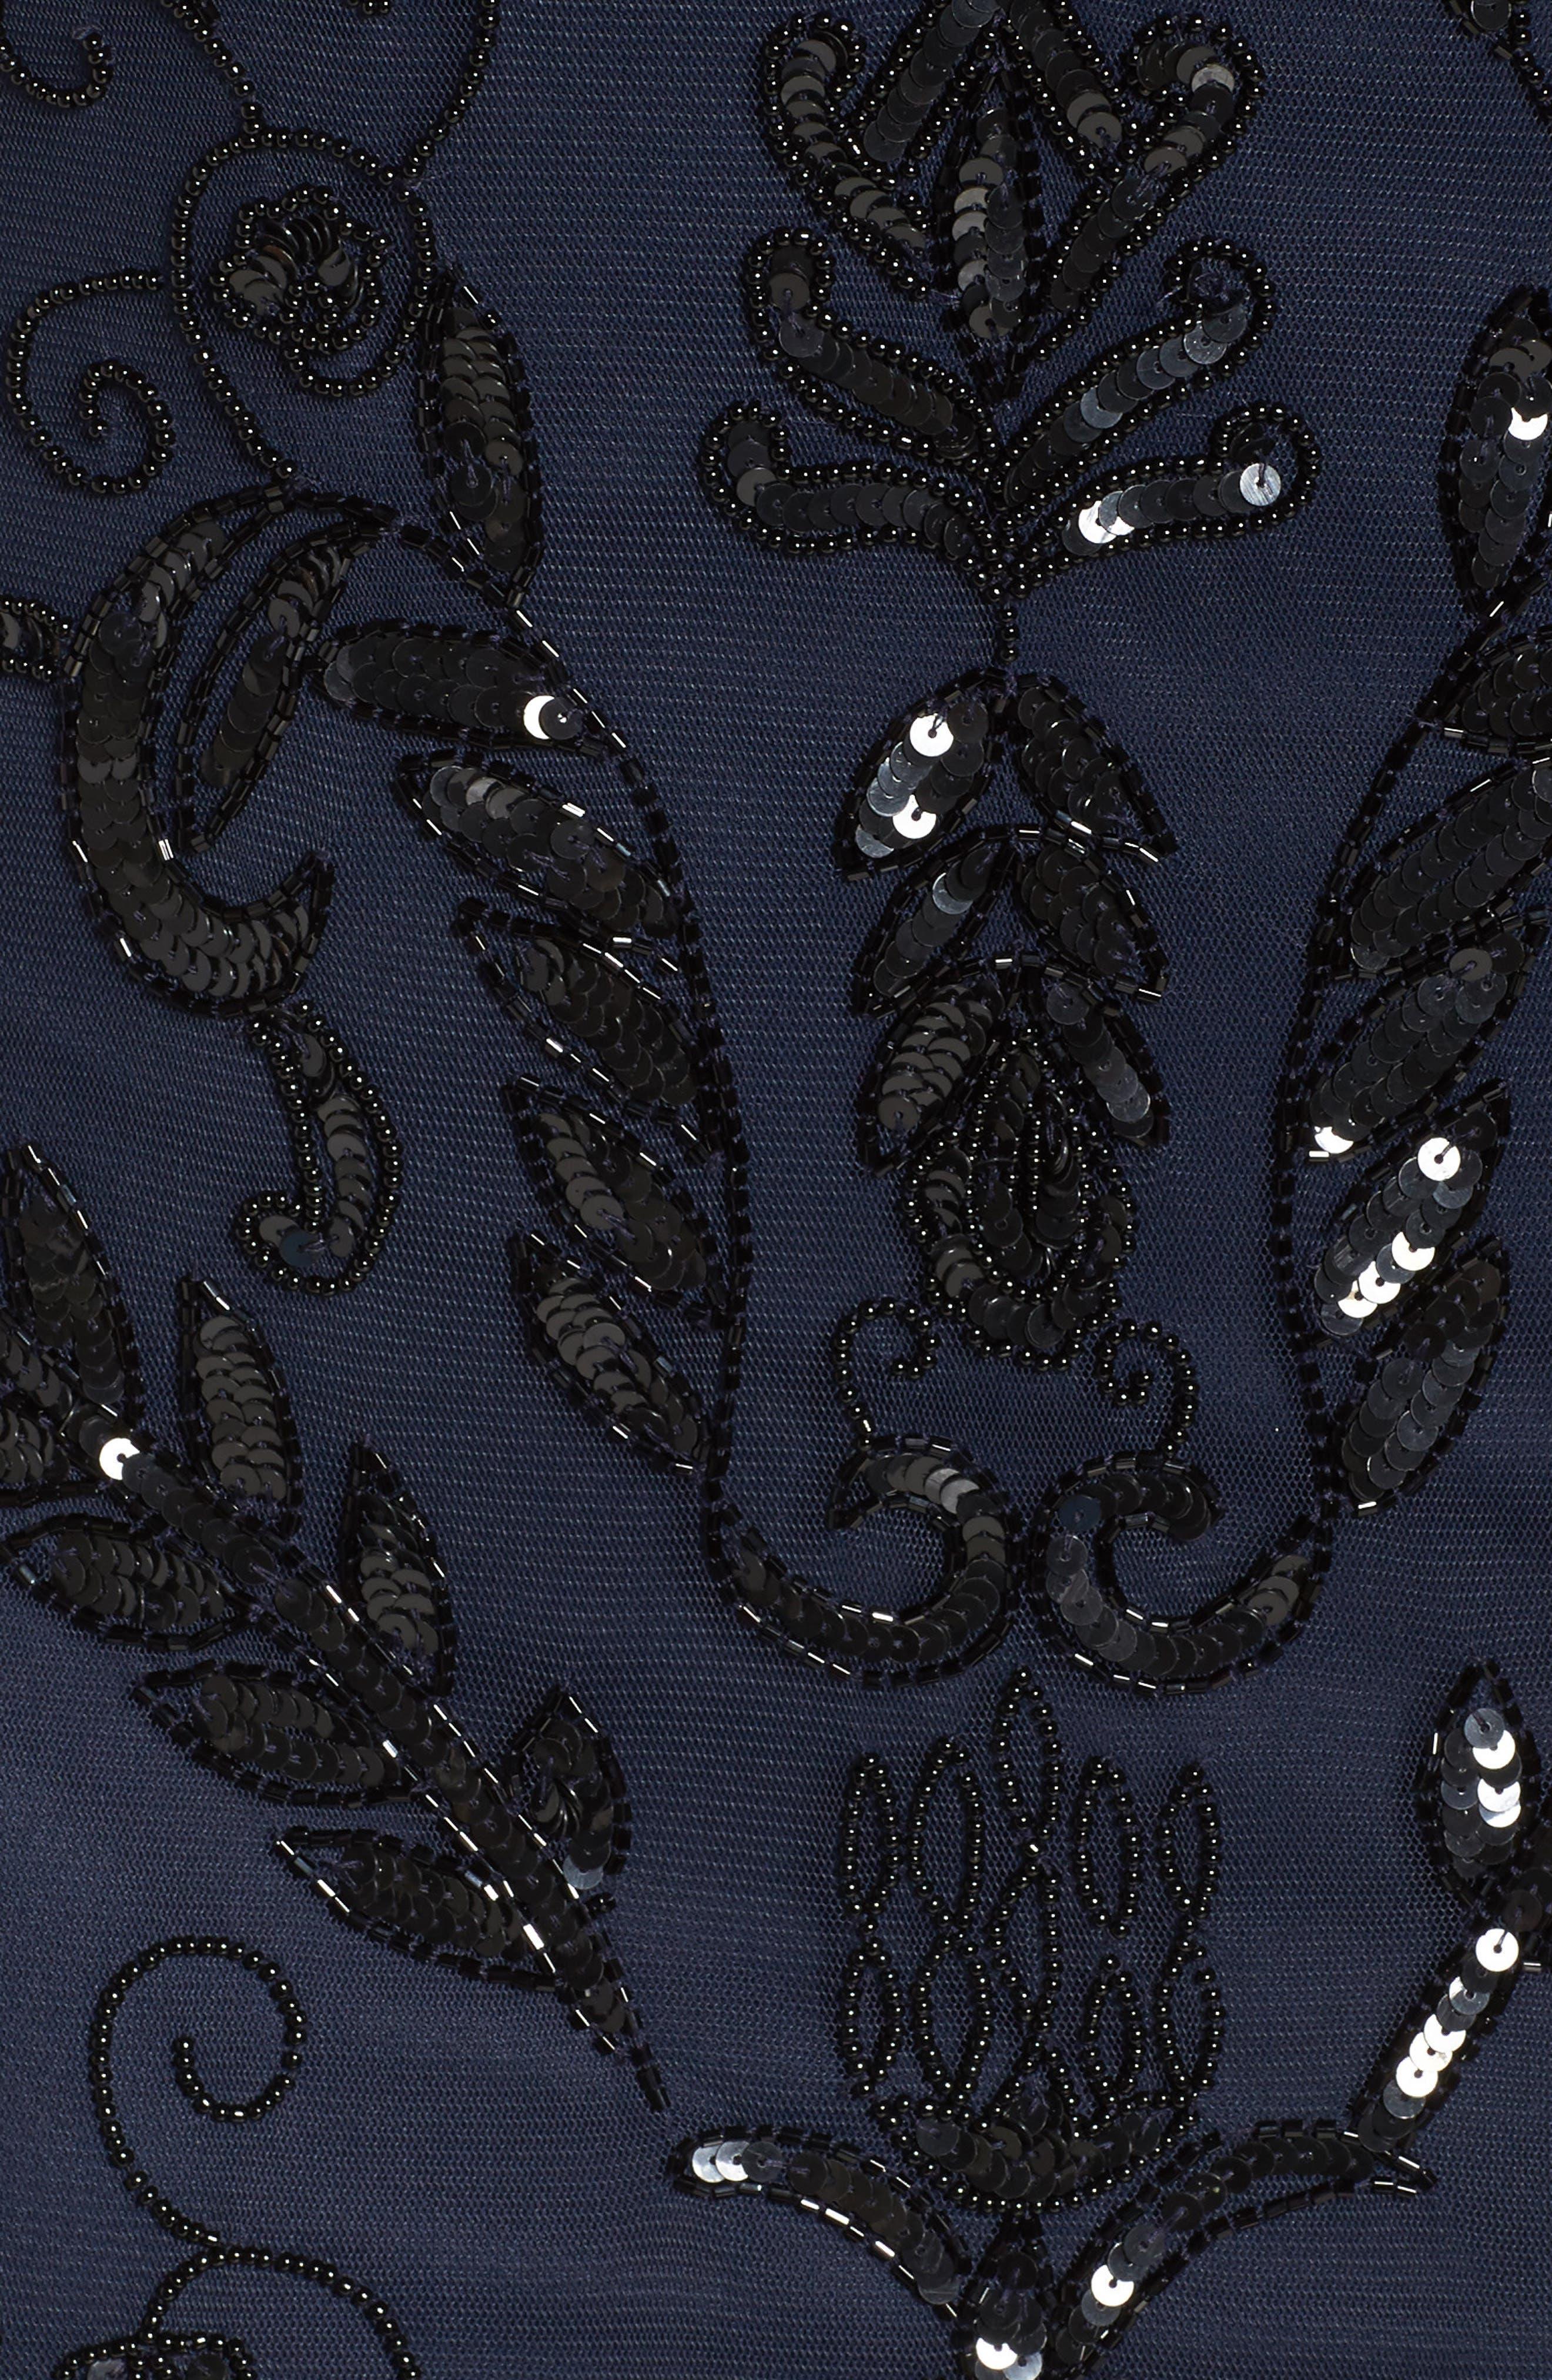 Embellished Tea Length Sheath Dress,                             Alternate thumbnail 5, color,                             415